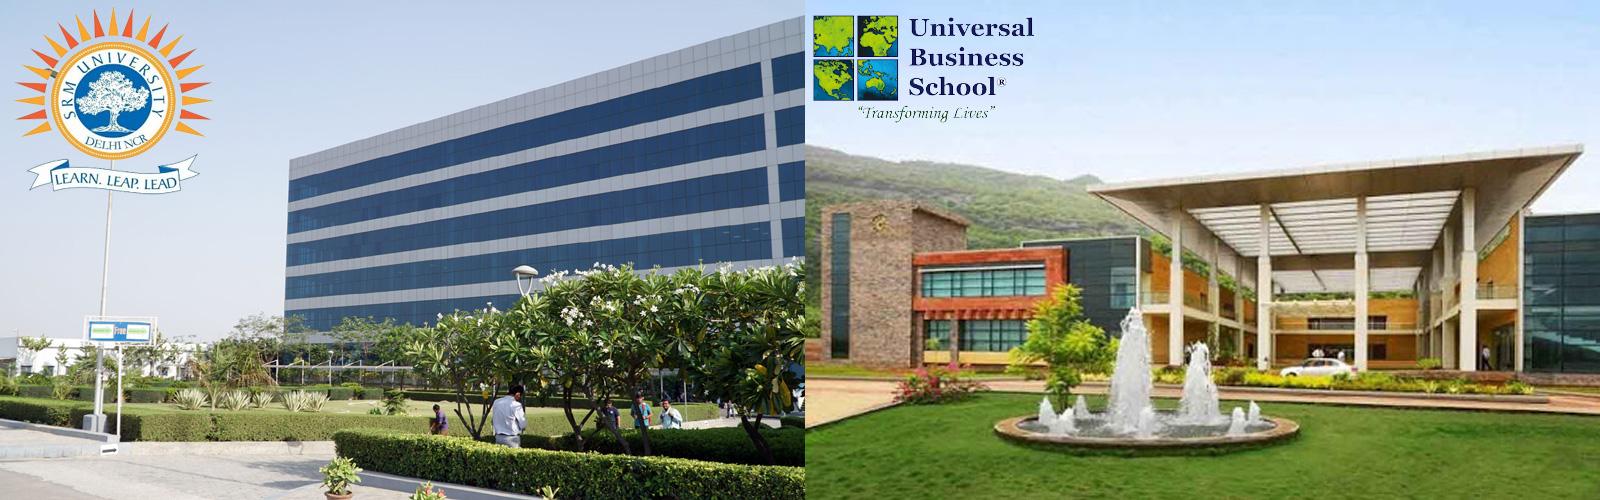 UBS university